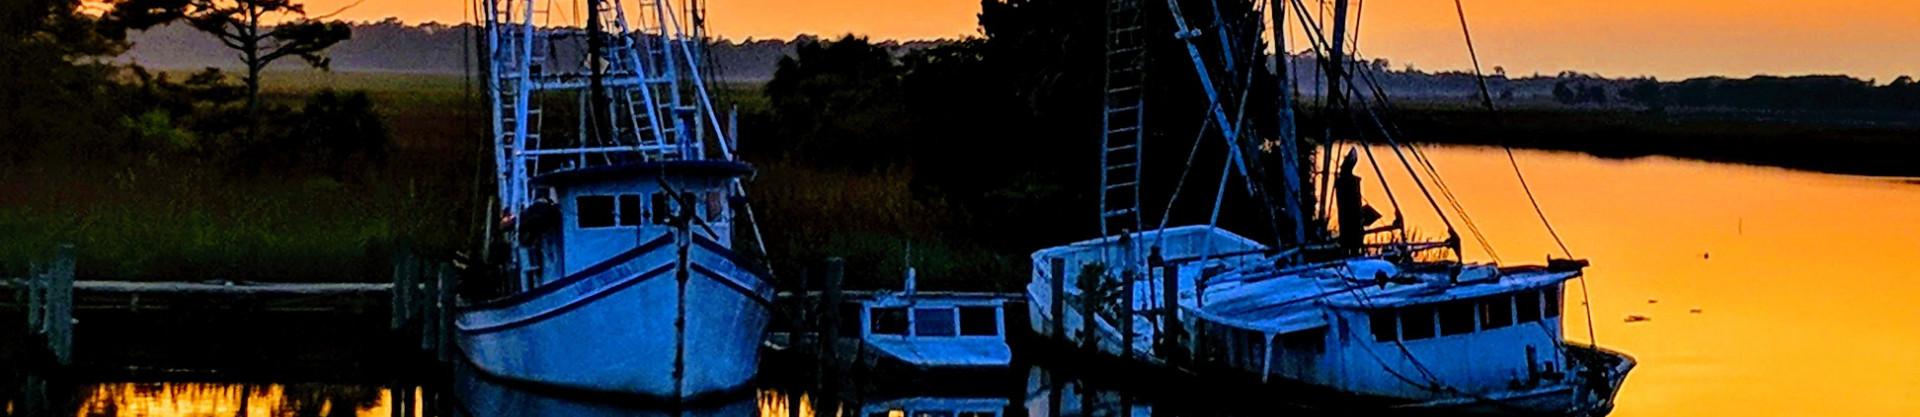 Apalachicola Boats